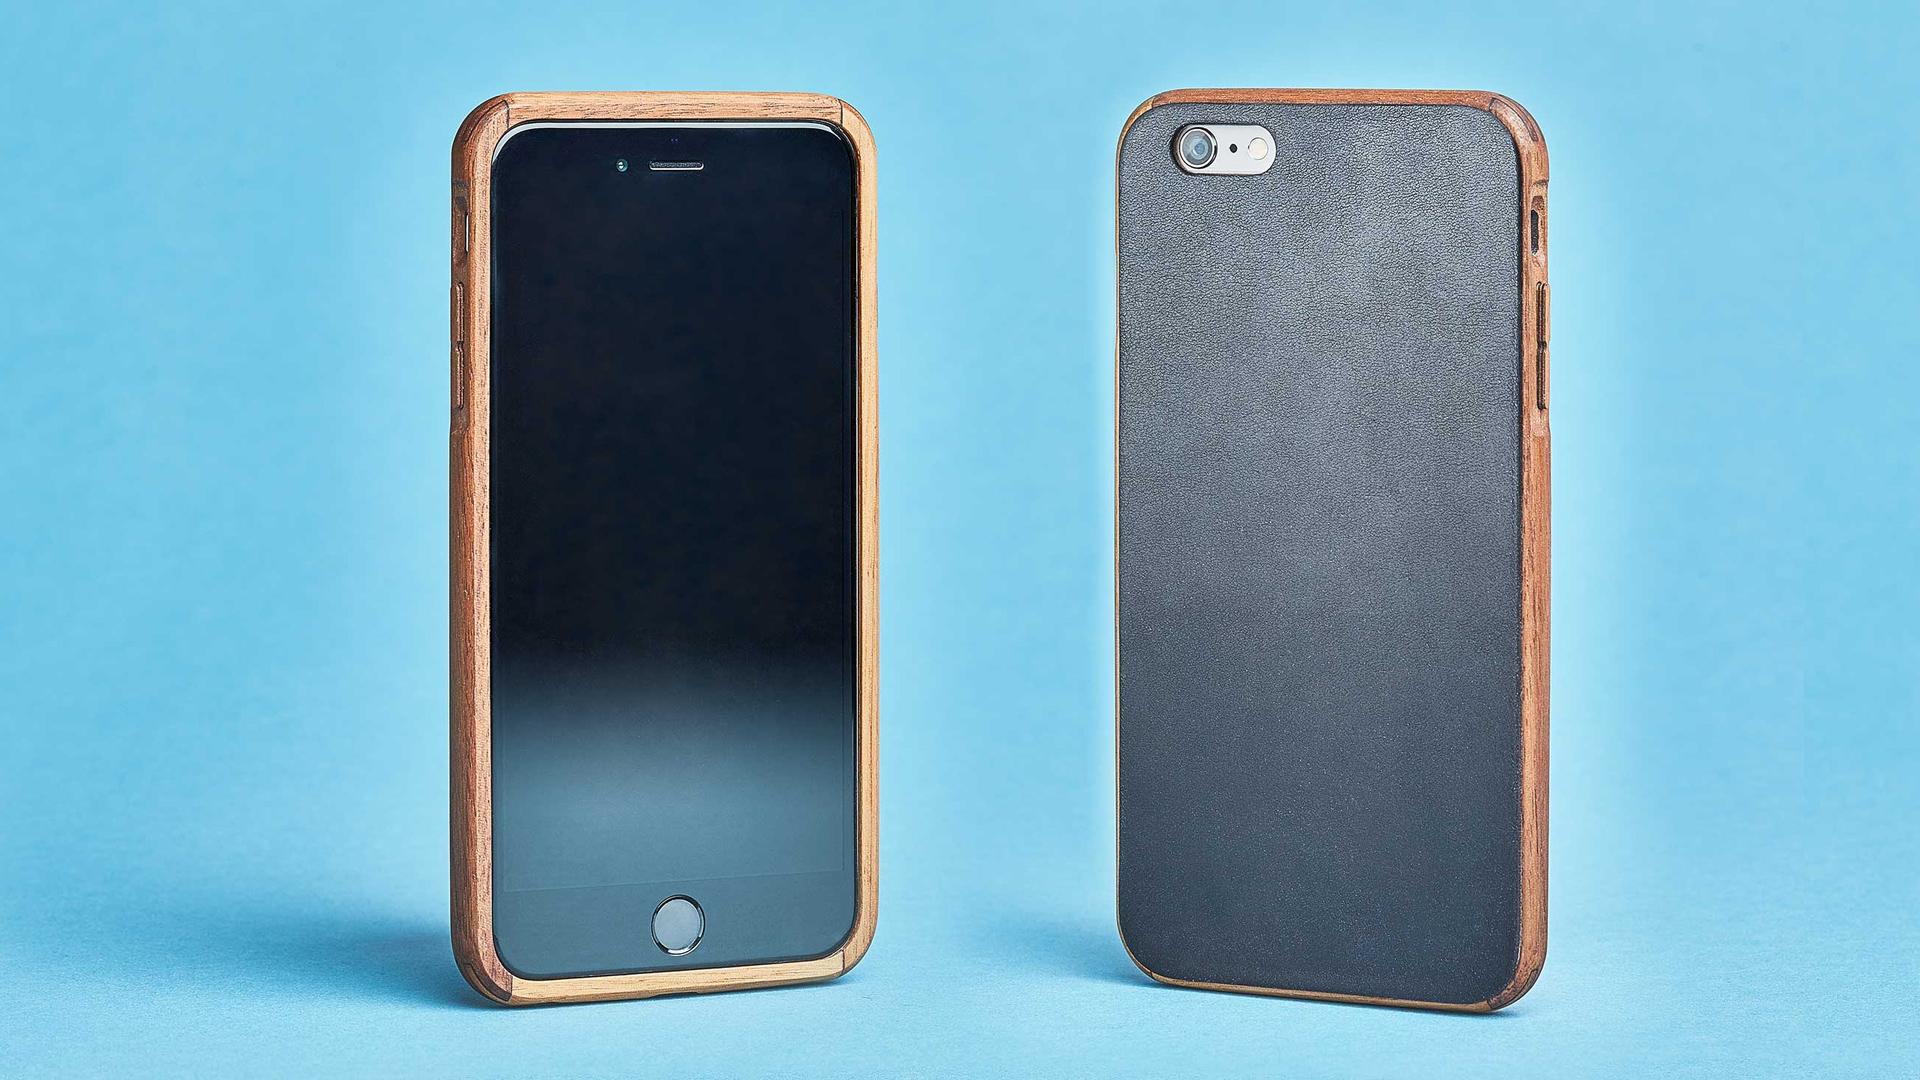 btVvtRaNHPLbs7jNmVibWP - The best iPhone 7 Plus cases